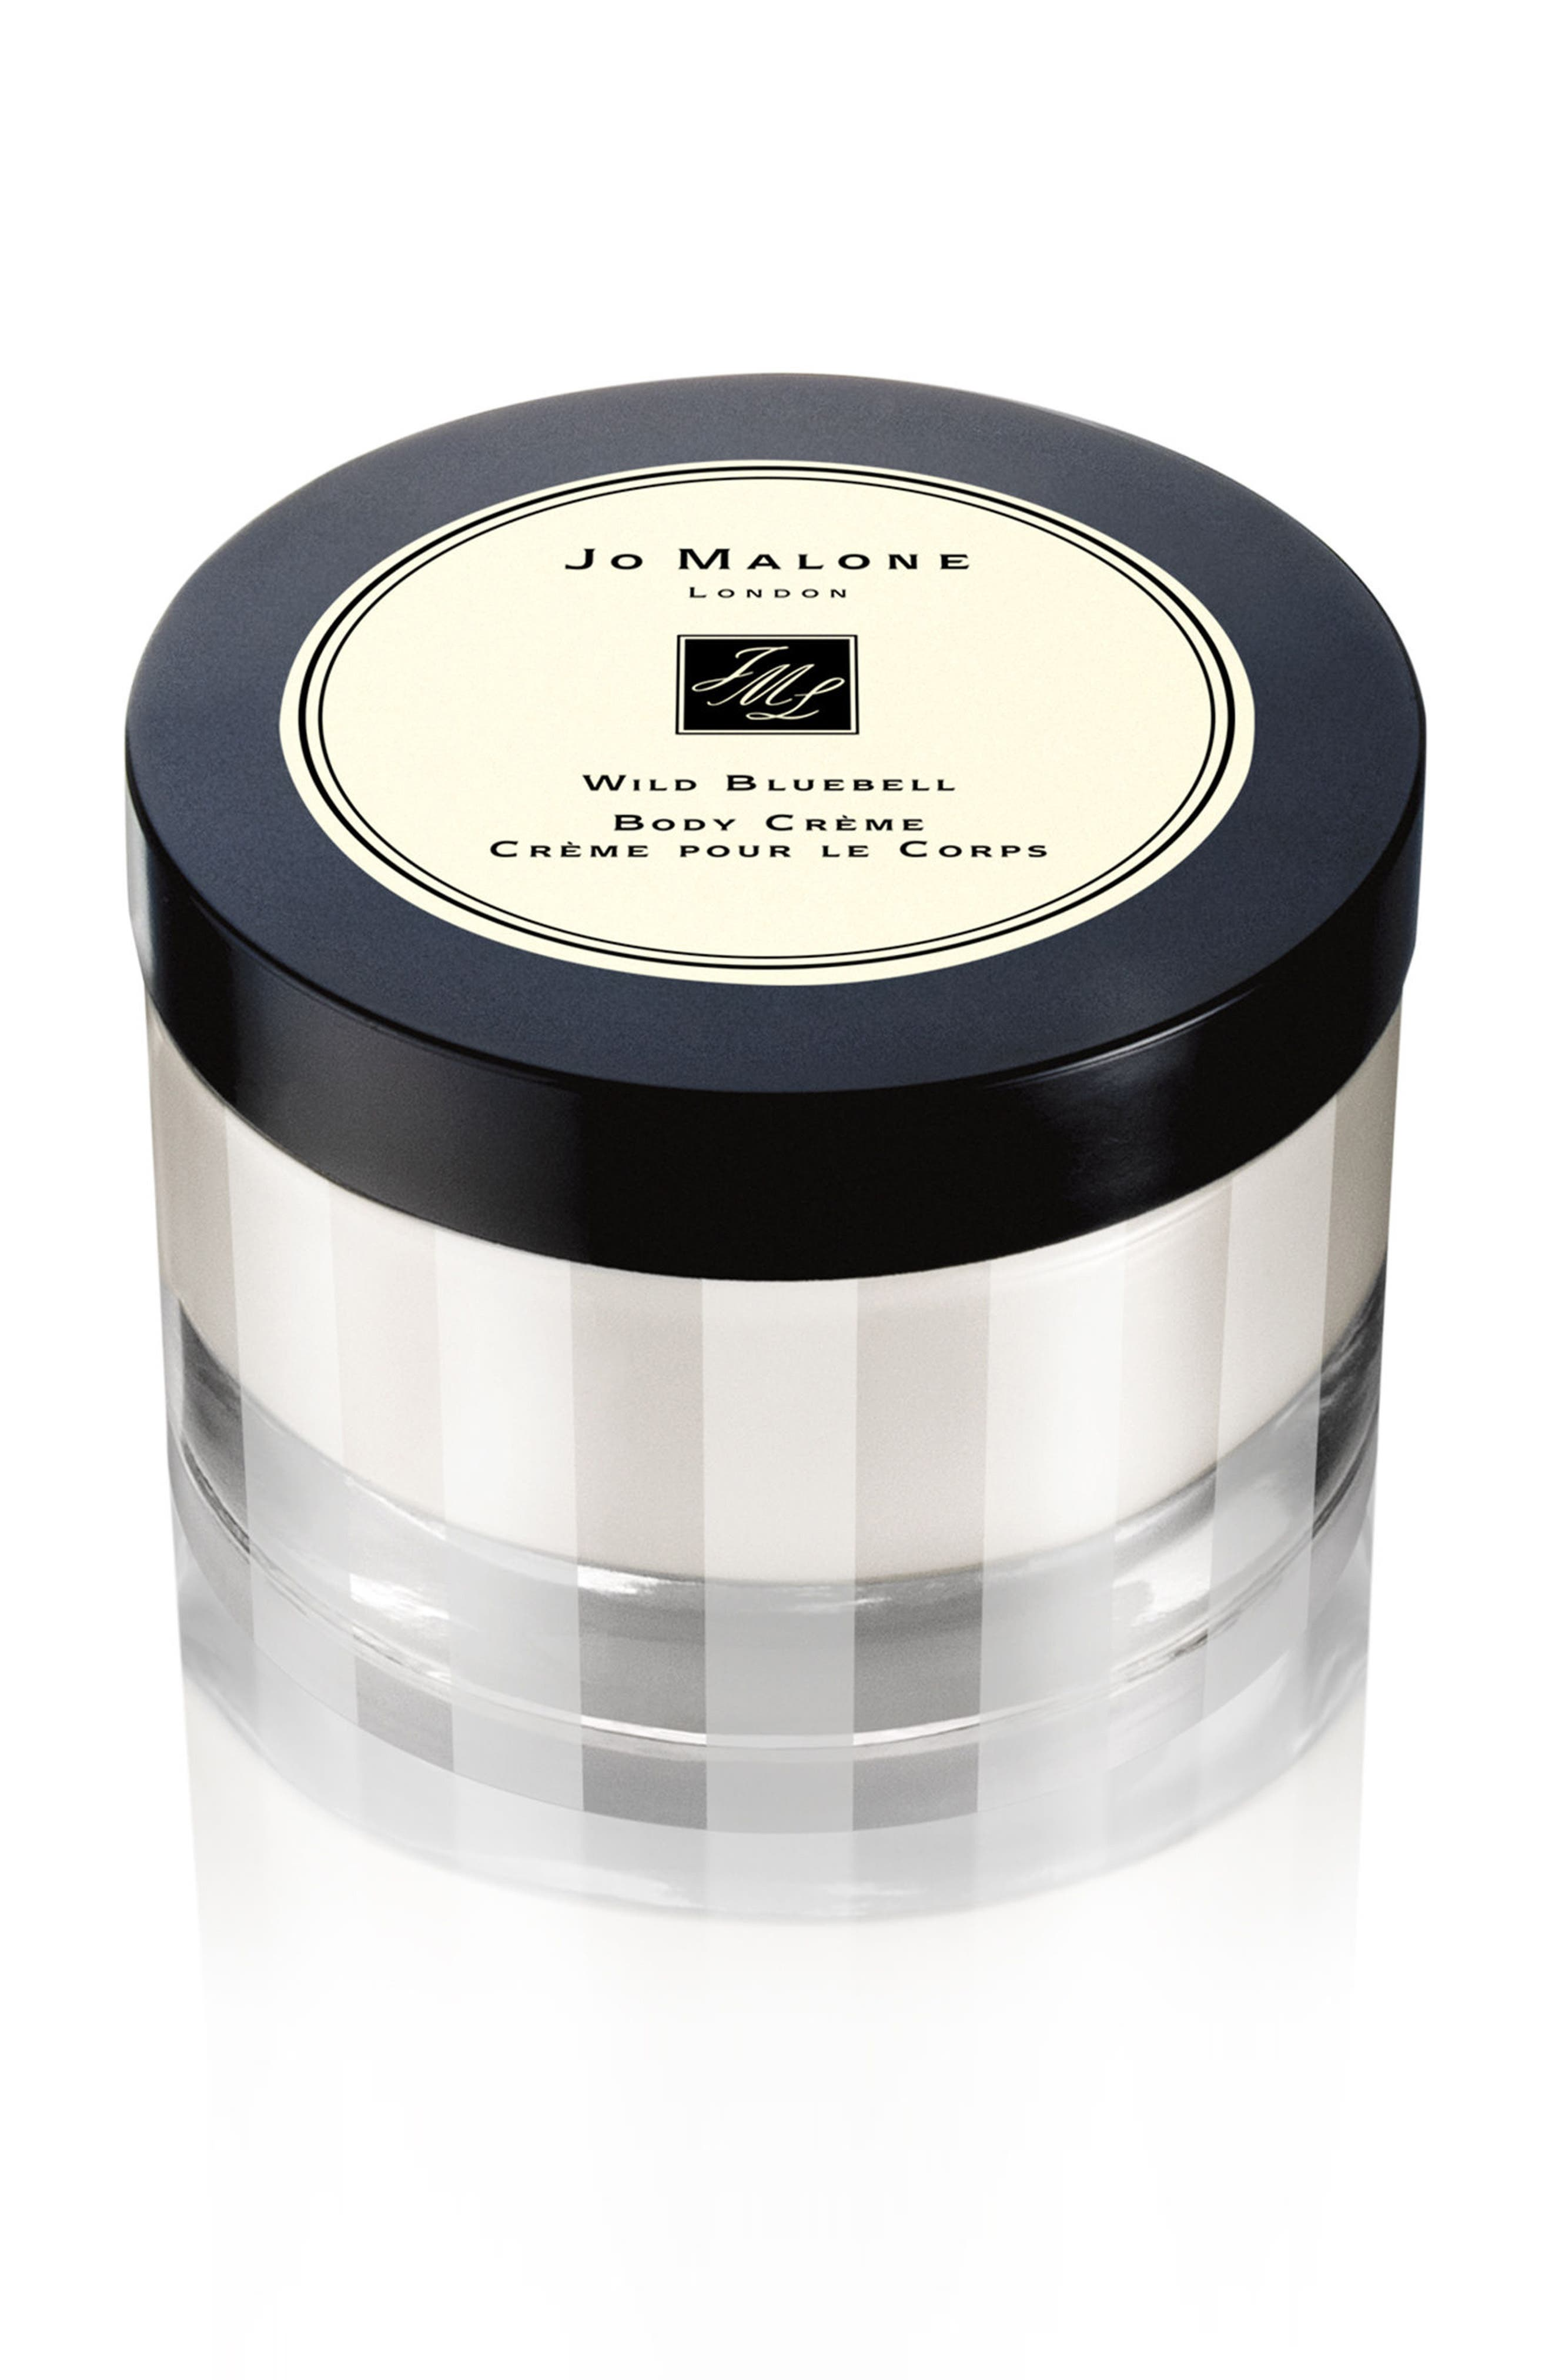 Alternate Image 1 Selected - Jo Malone London™ Wild Bluebell Body Crème